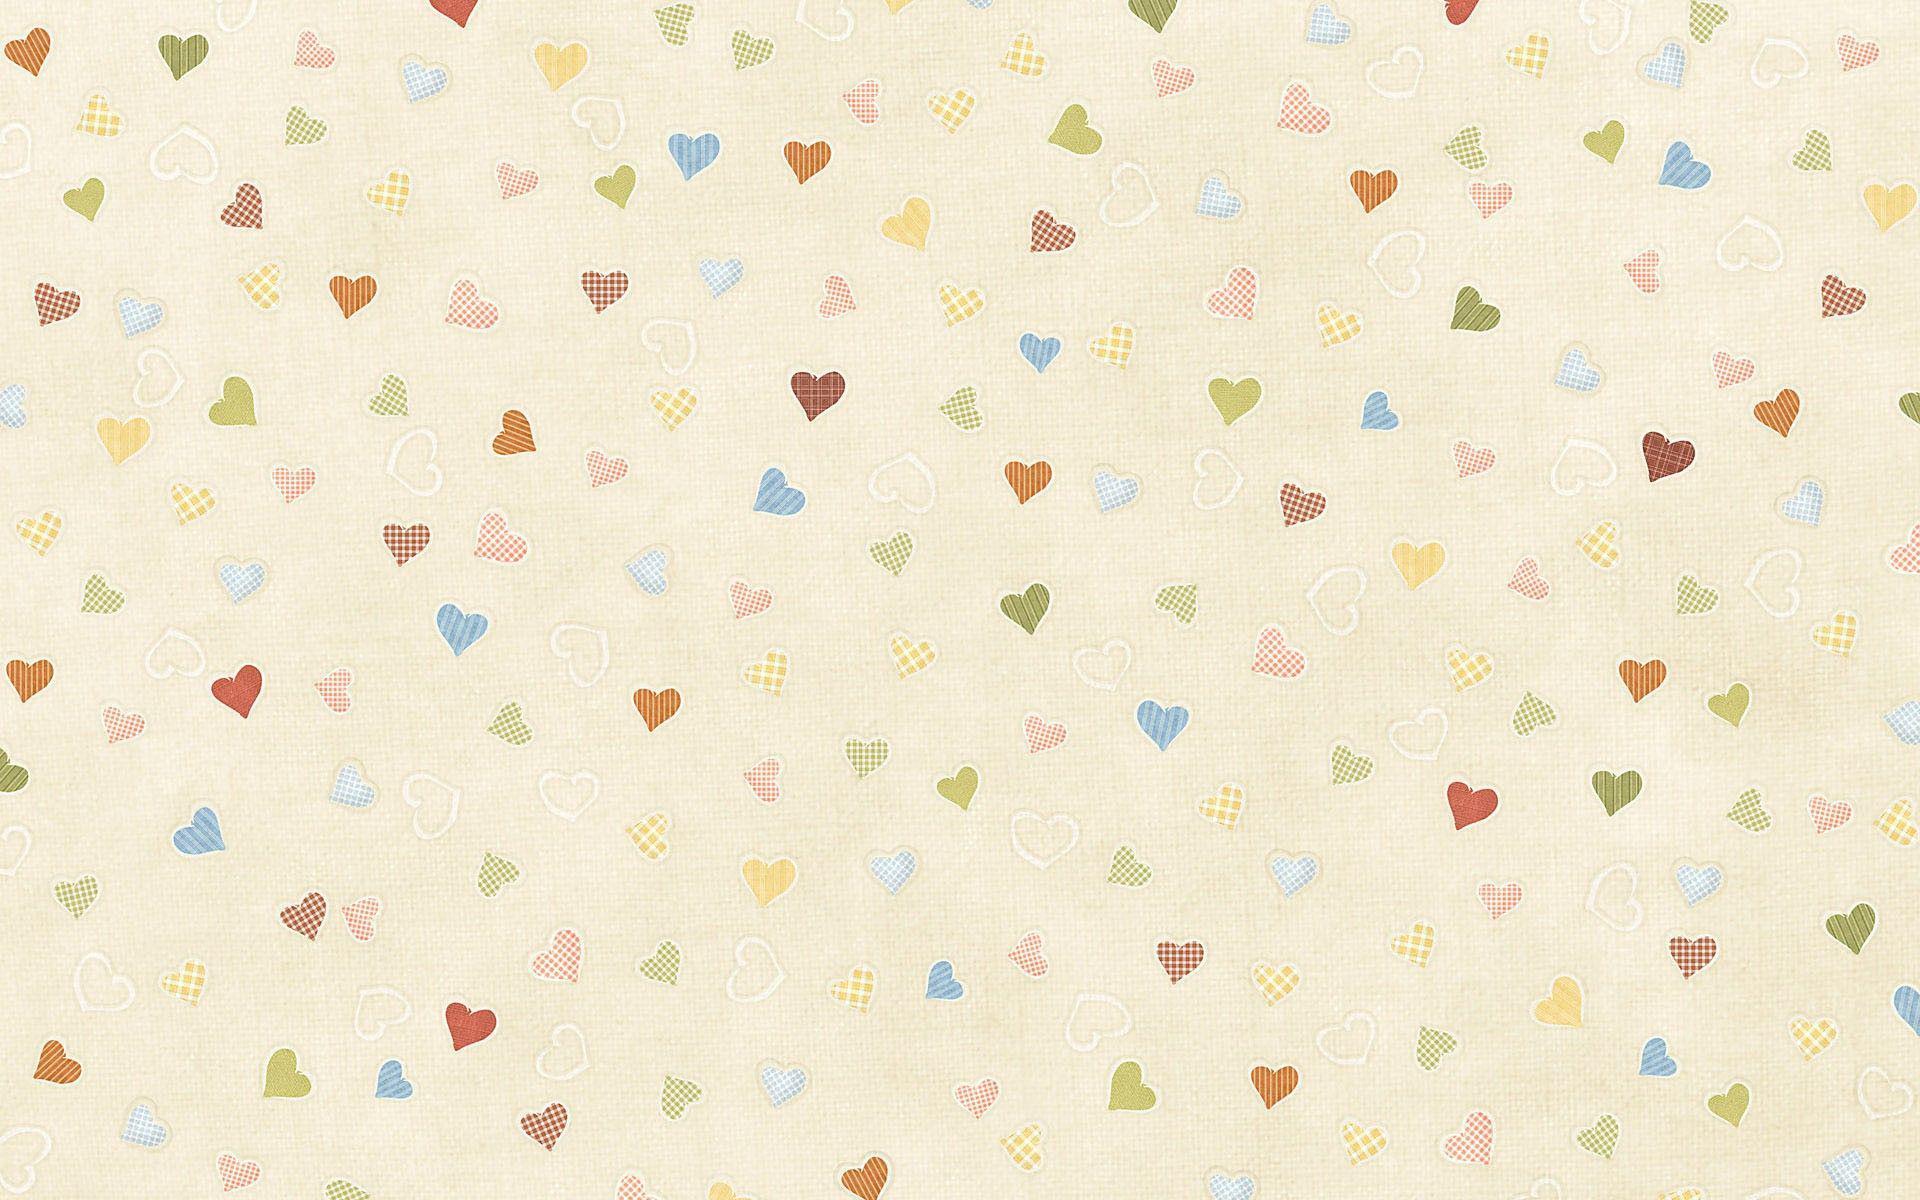 Multicolored Hearts Pattern Wallpaper